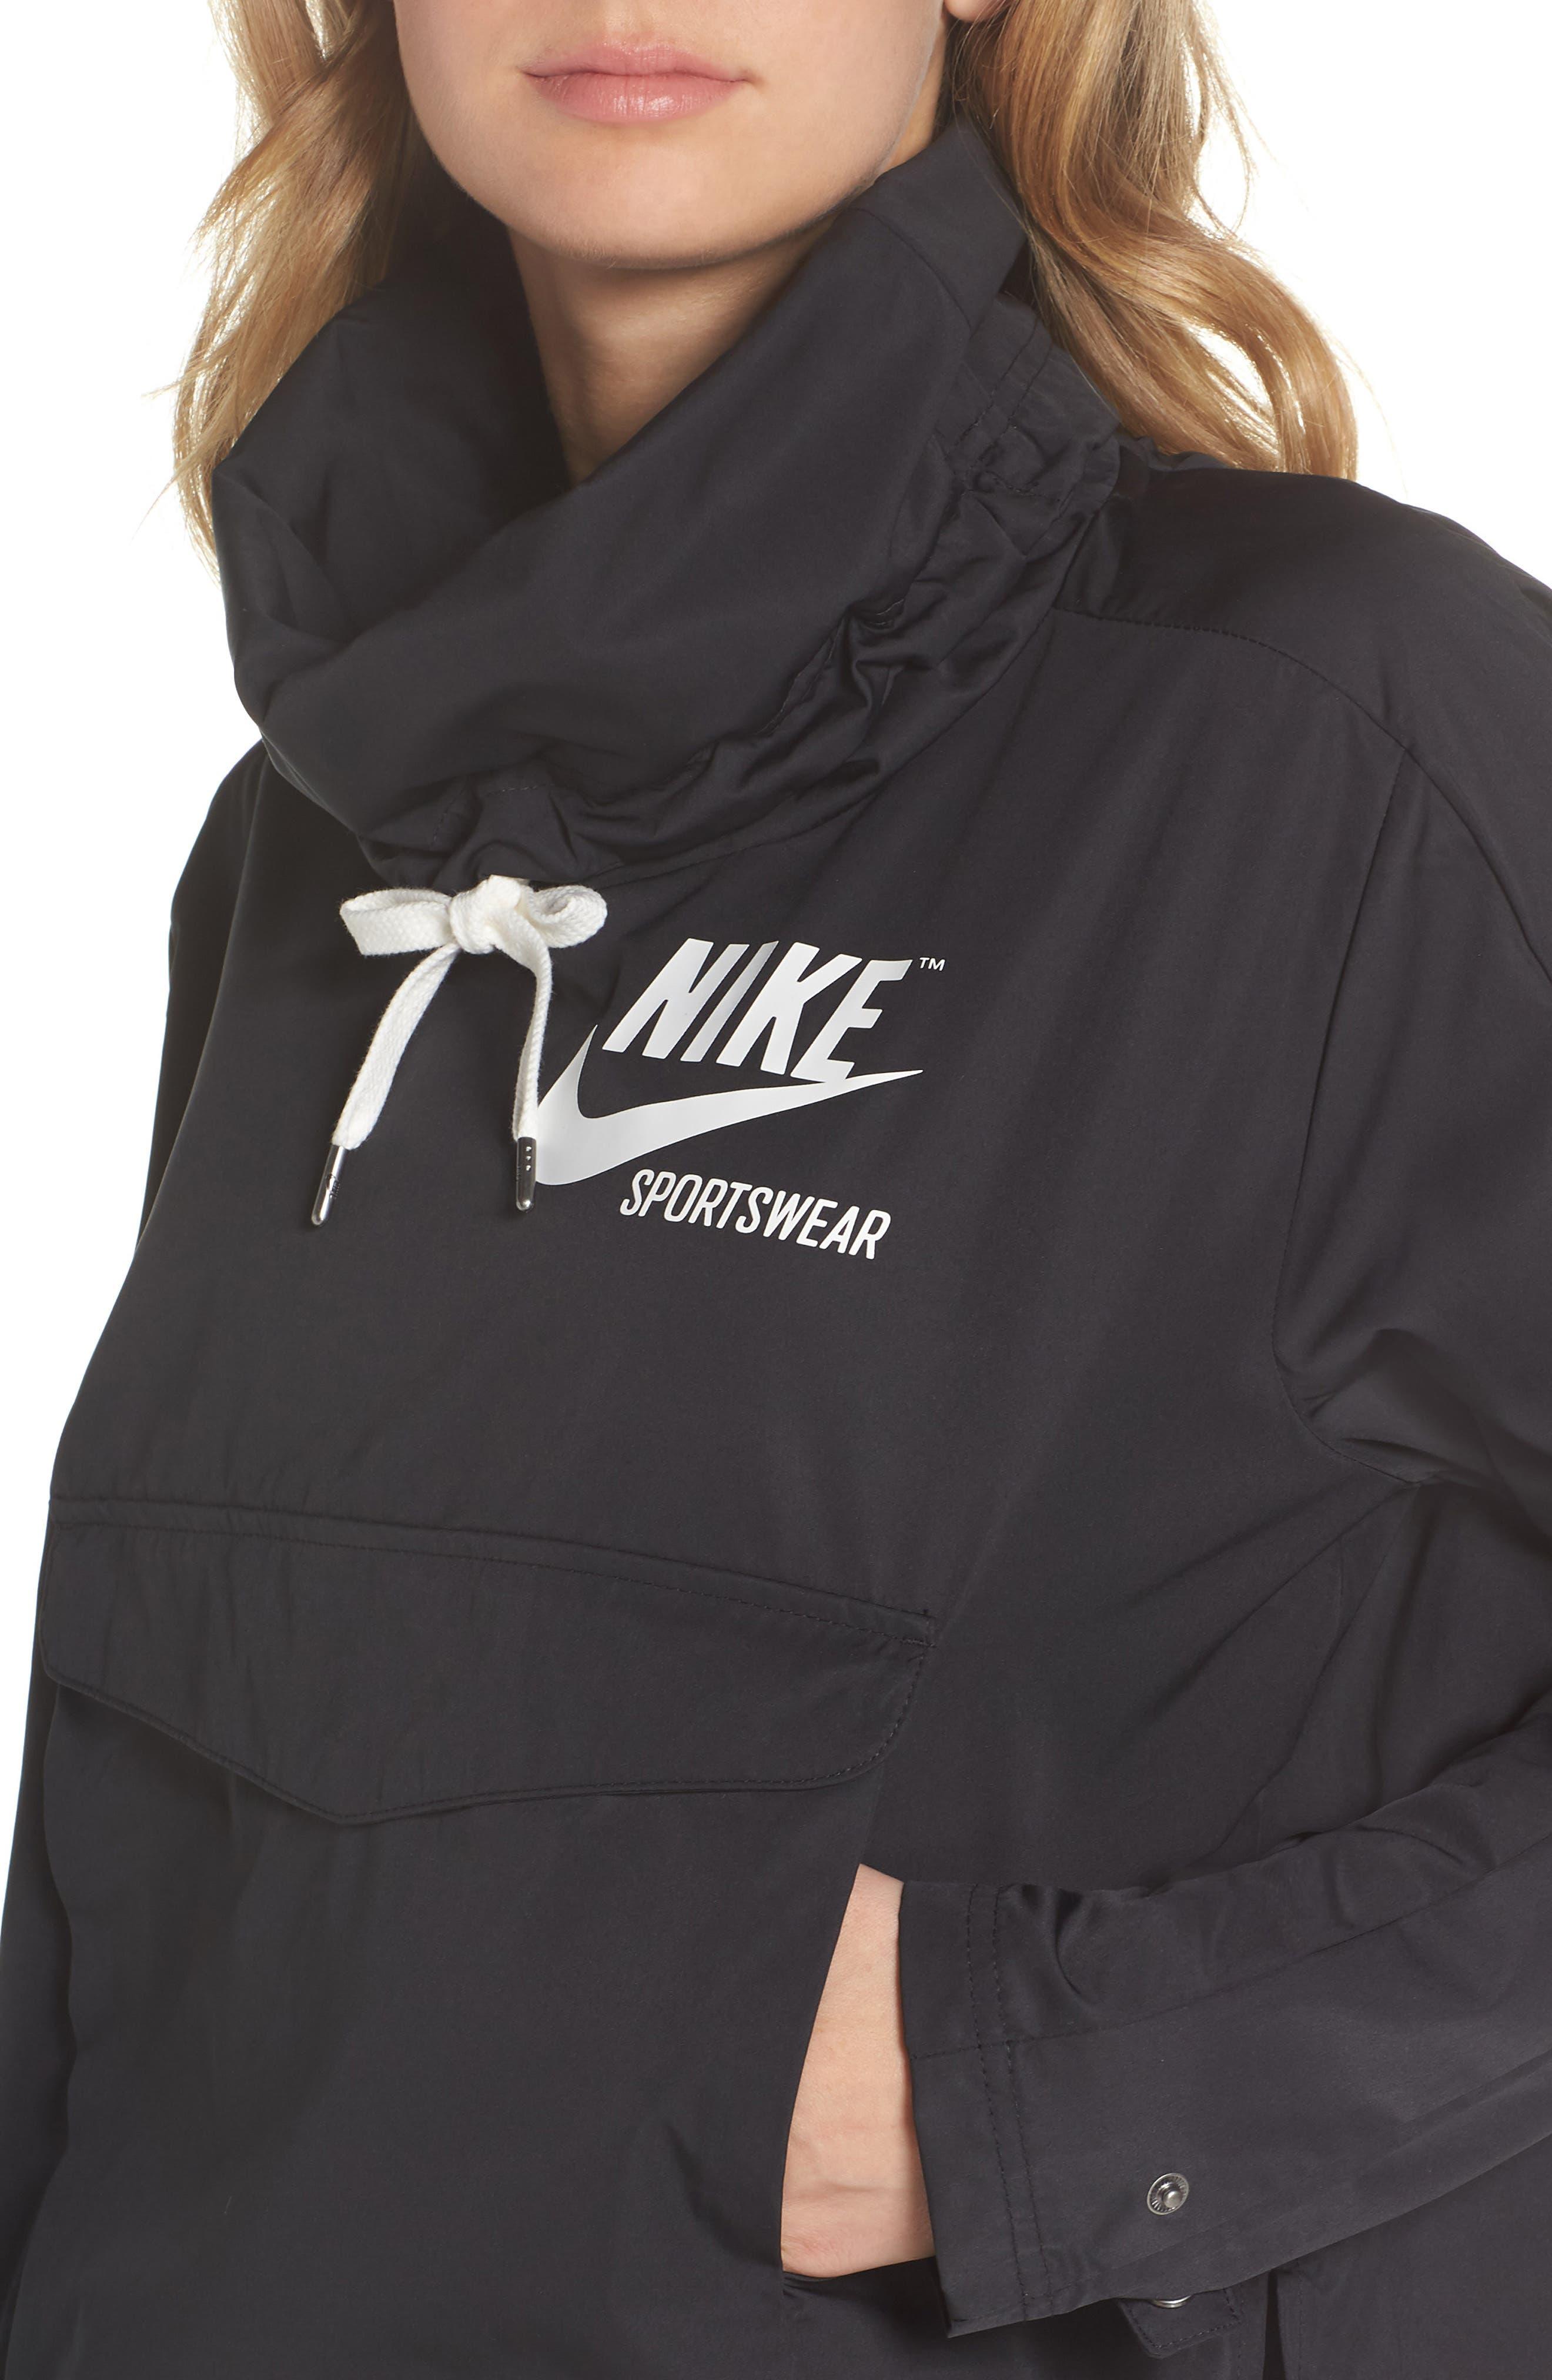 Sportswear Archive Jacket,                             Alternate thumbnail 4, color,                             Black/ Black